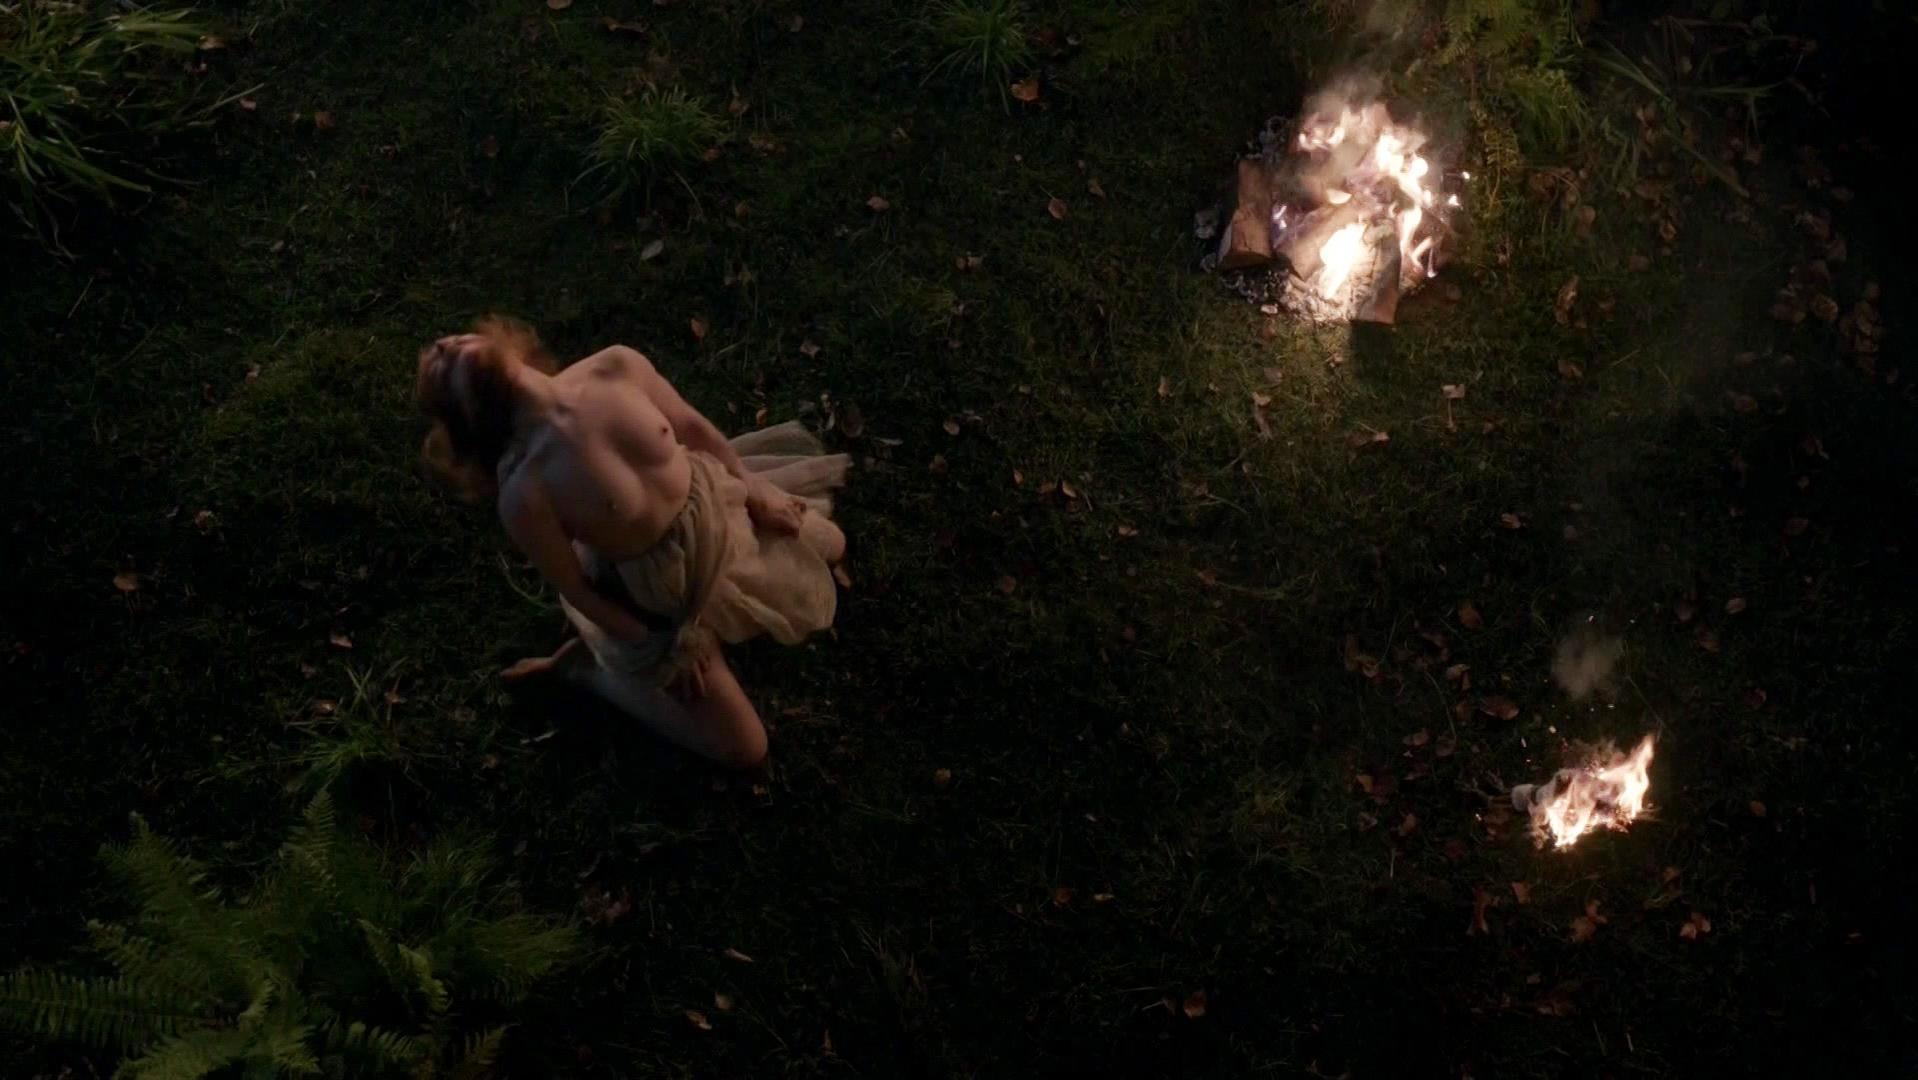 Lotte Verbeek nude - Outlander s01e10 (2015)